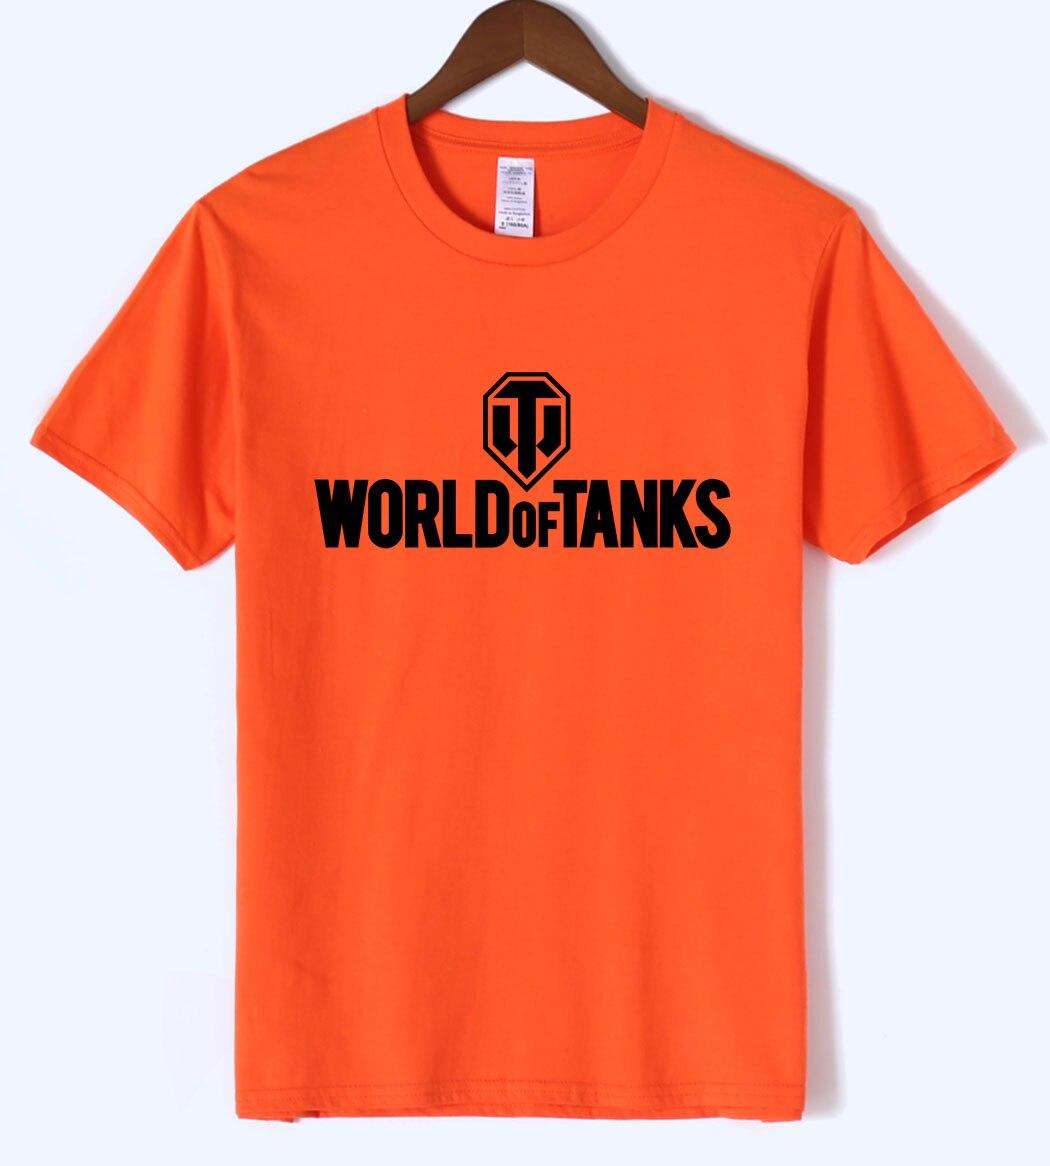 World Of Tanks 2019 Summer Print T-shirt Cool Undertale Fashion Mens T-shirts Brand Clothing Harajuku Top Tee Hip Hop Crossfit Men's Clothing